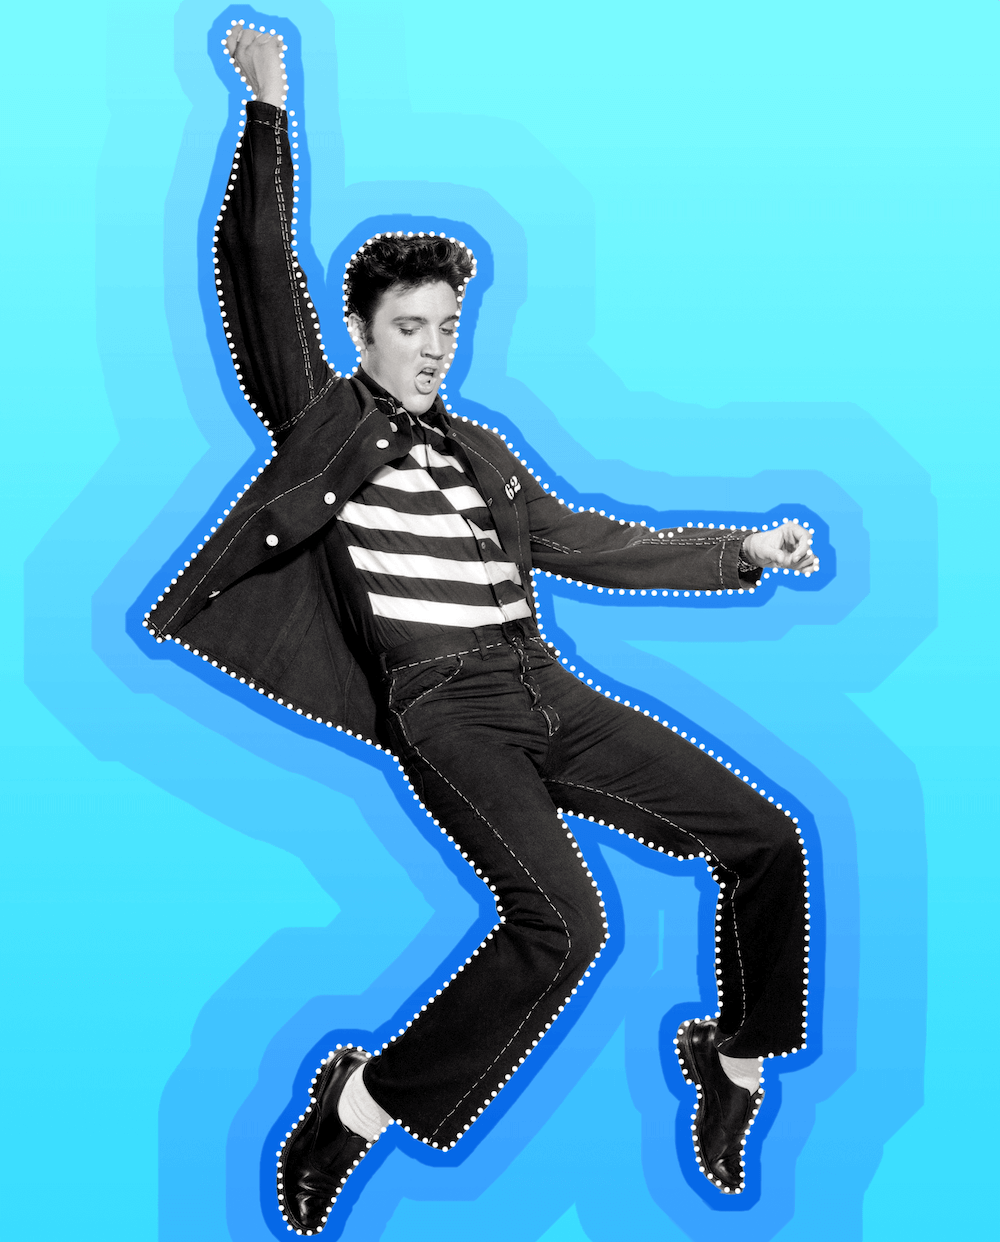 Body being segmented (Elvis!)